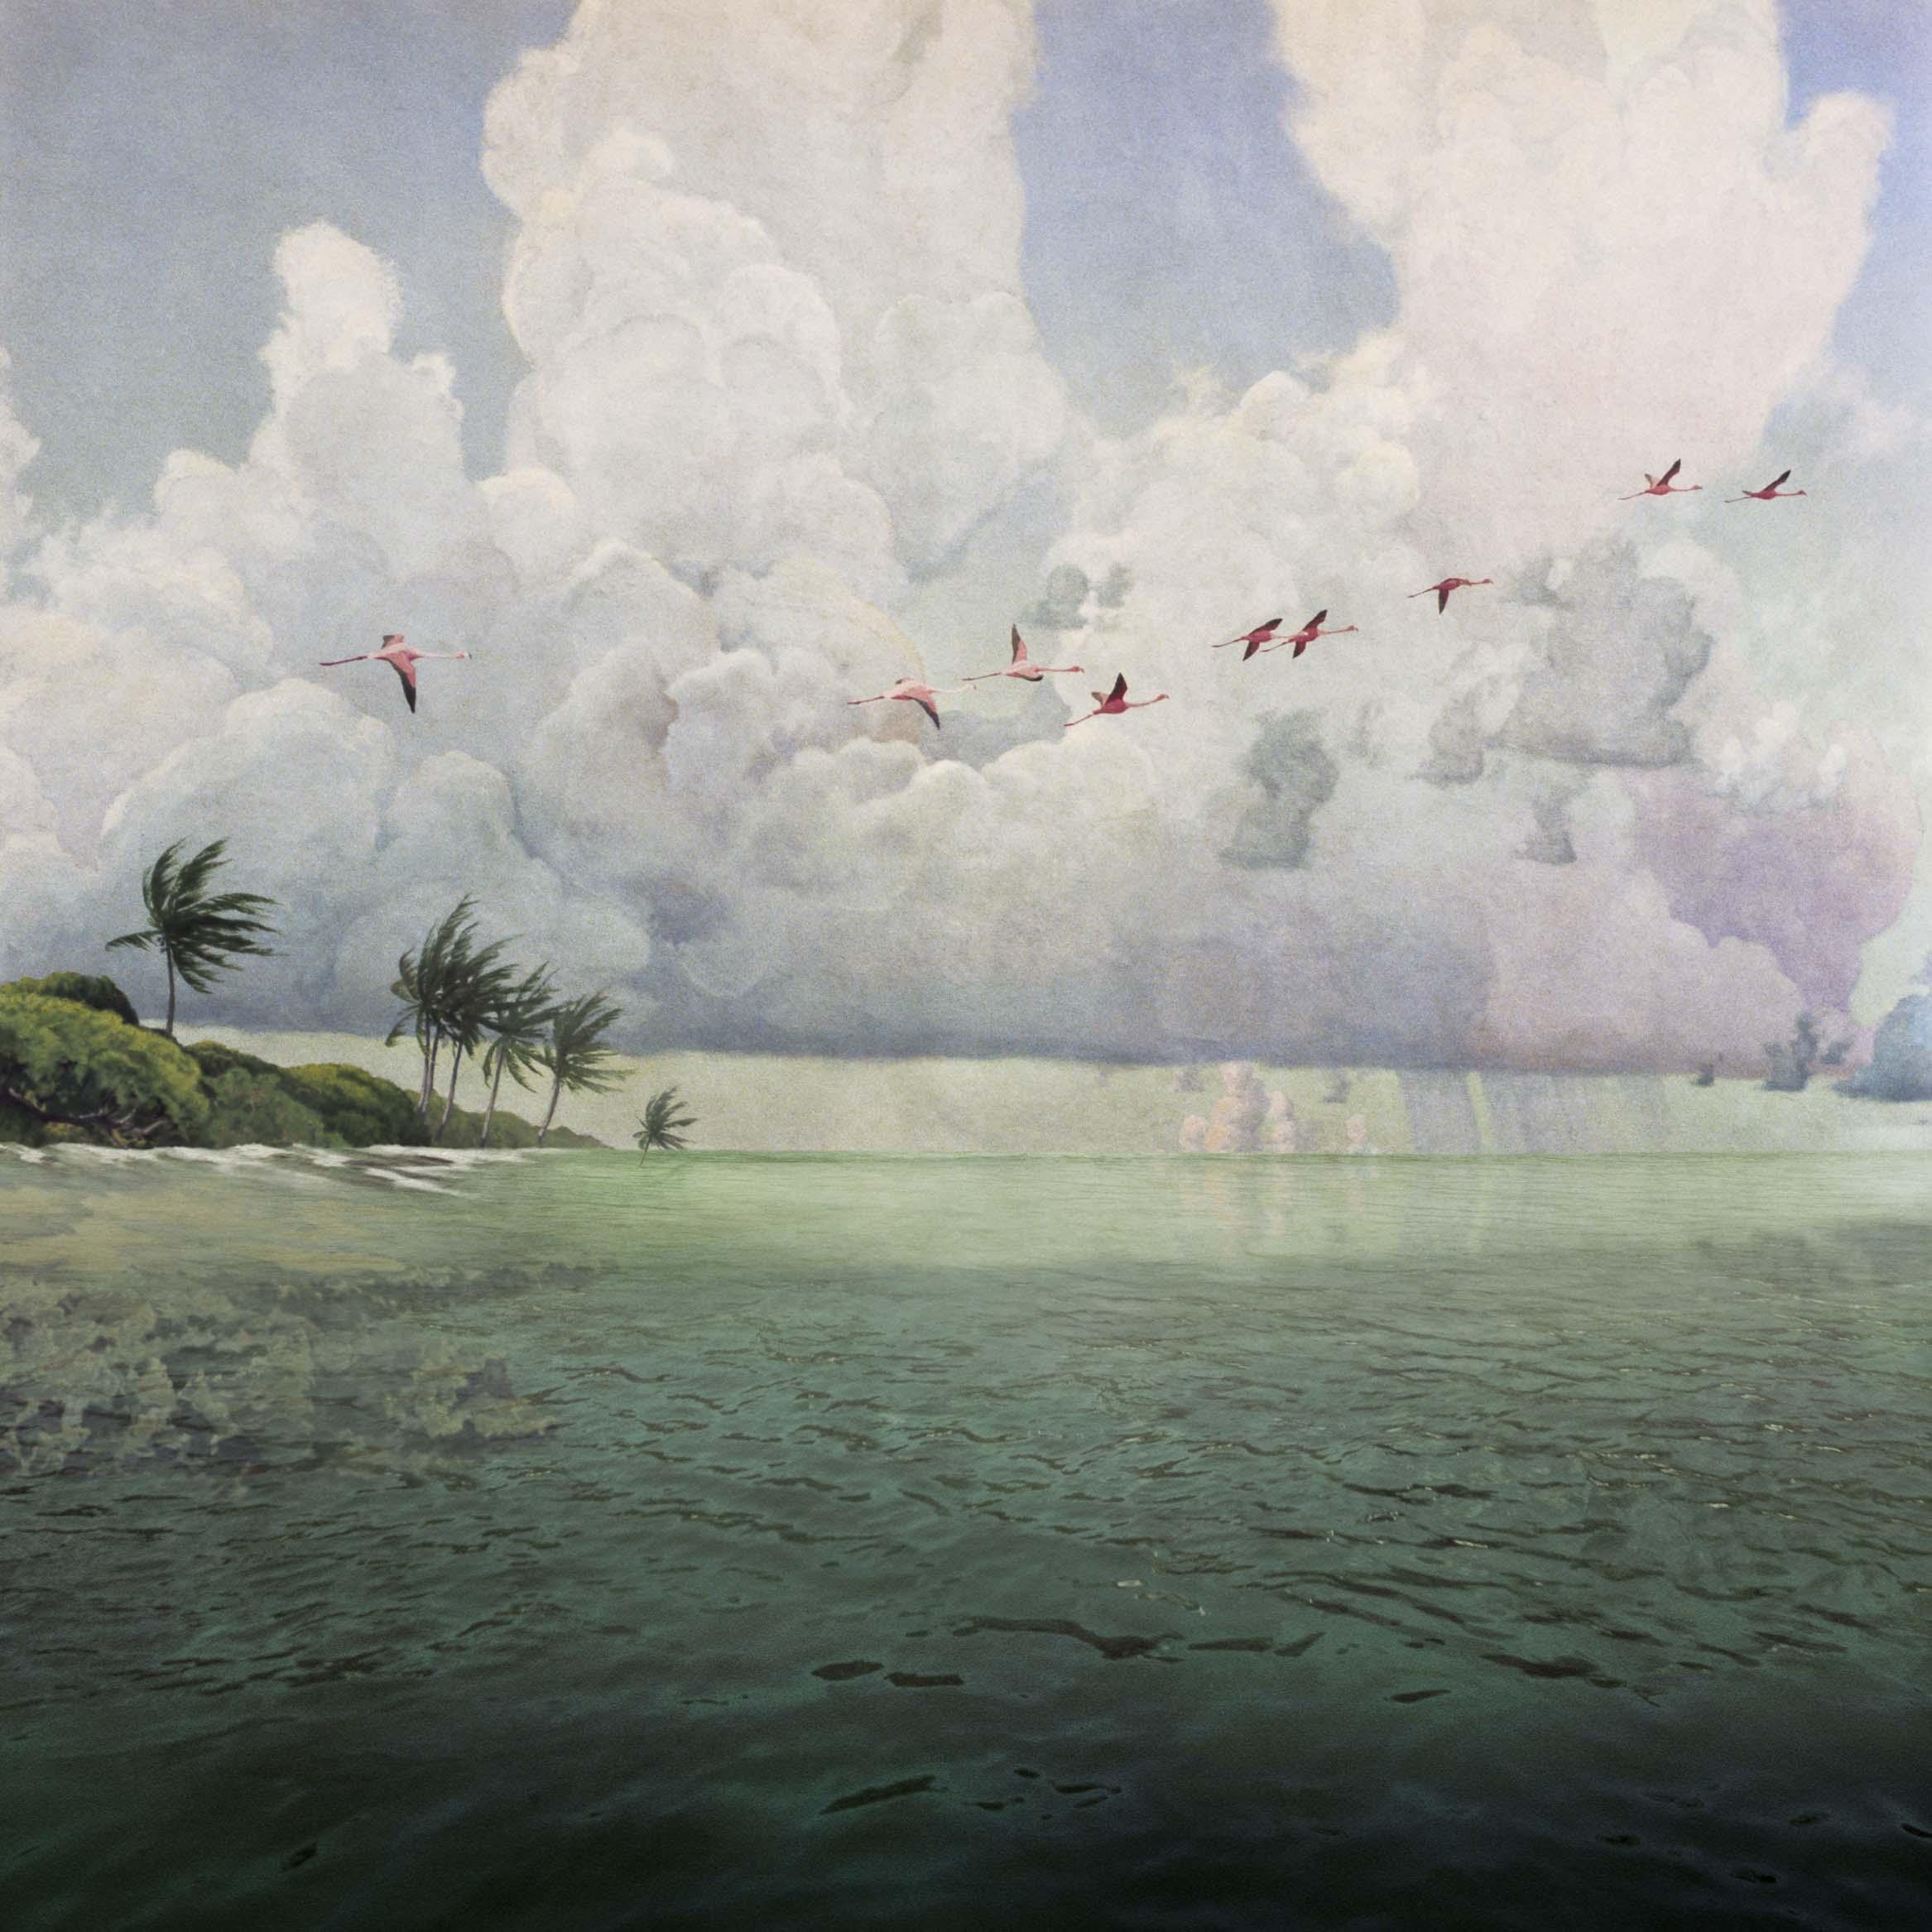 ANNE ZAHALKA     Rising Tide  2006/07 Type C photograph edition of 10   80 x 80 cm